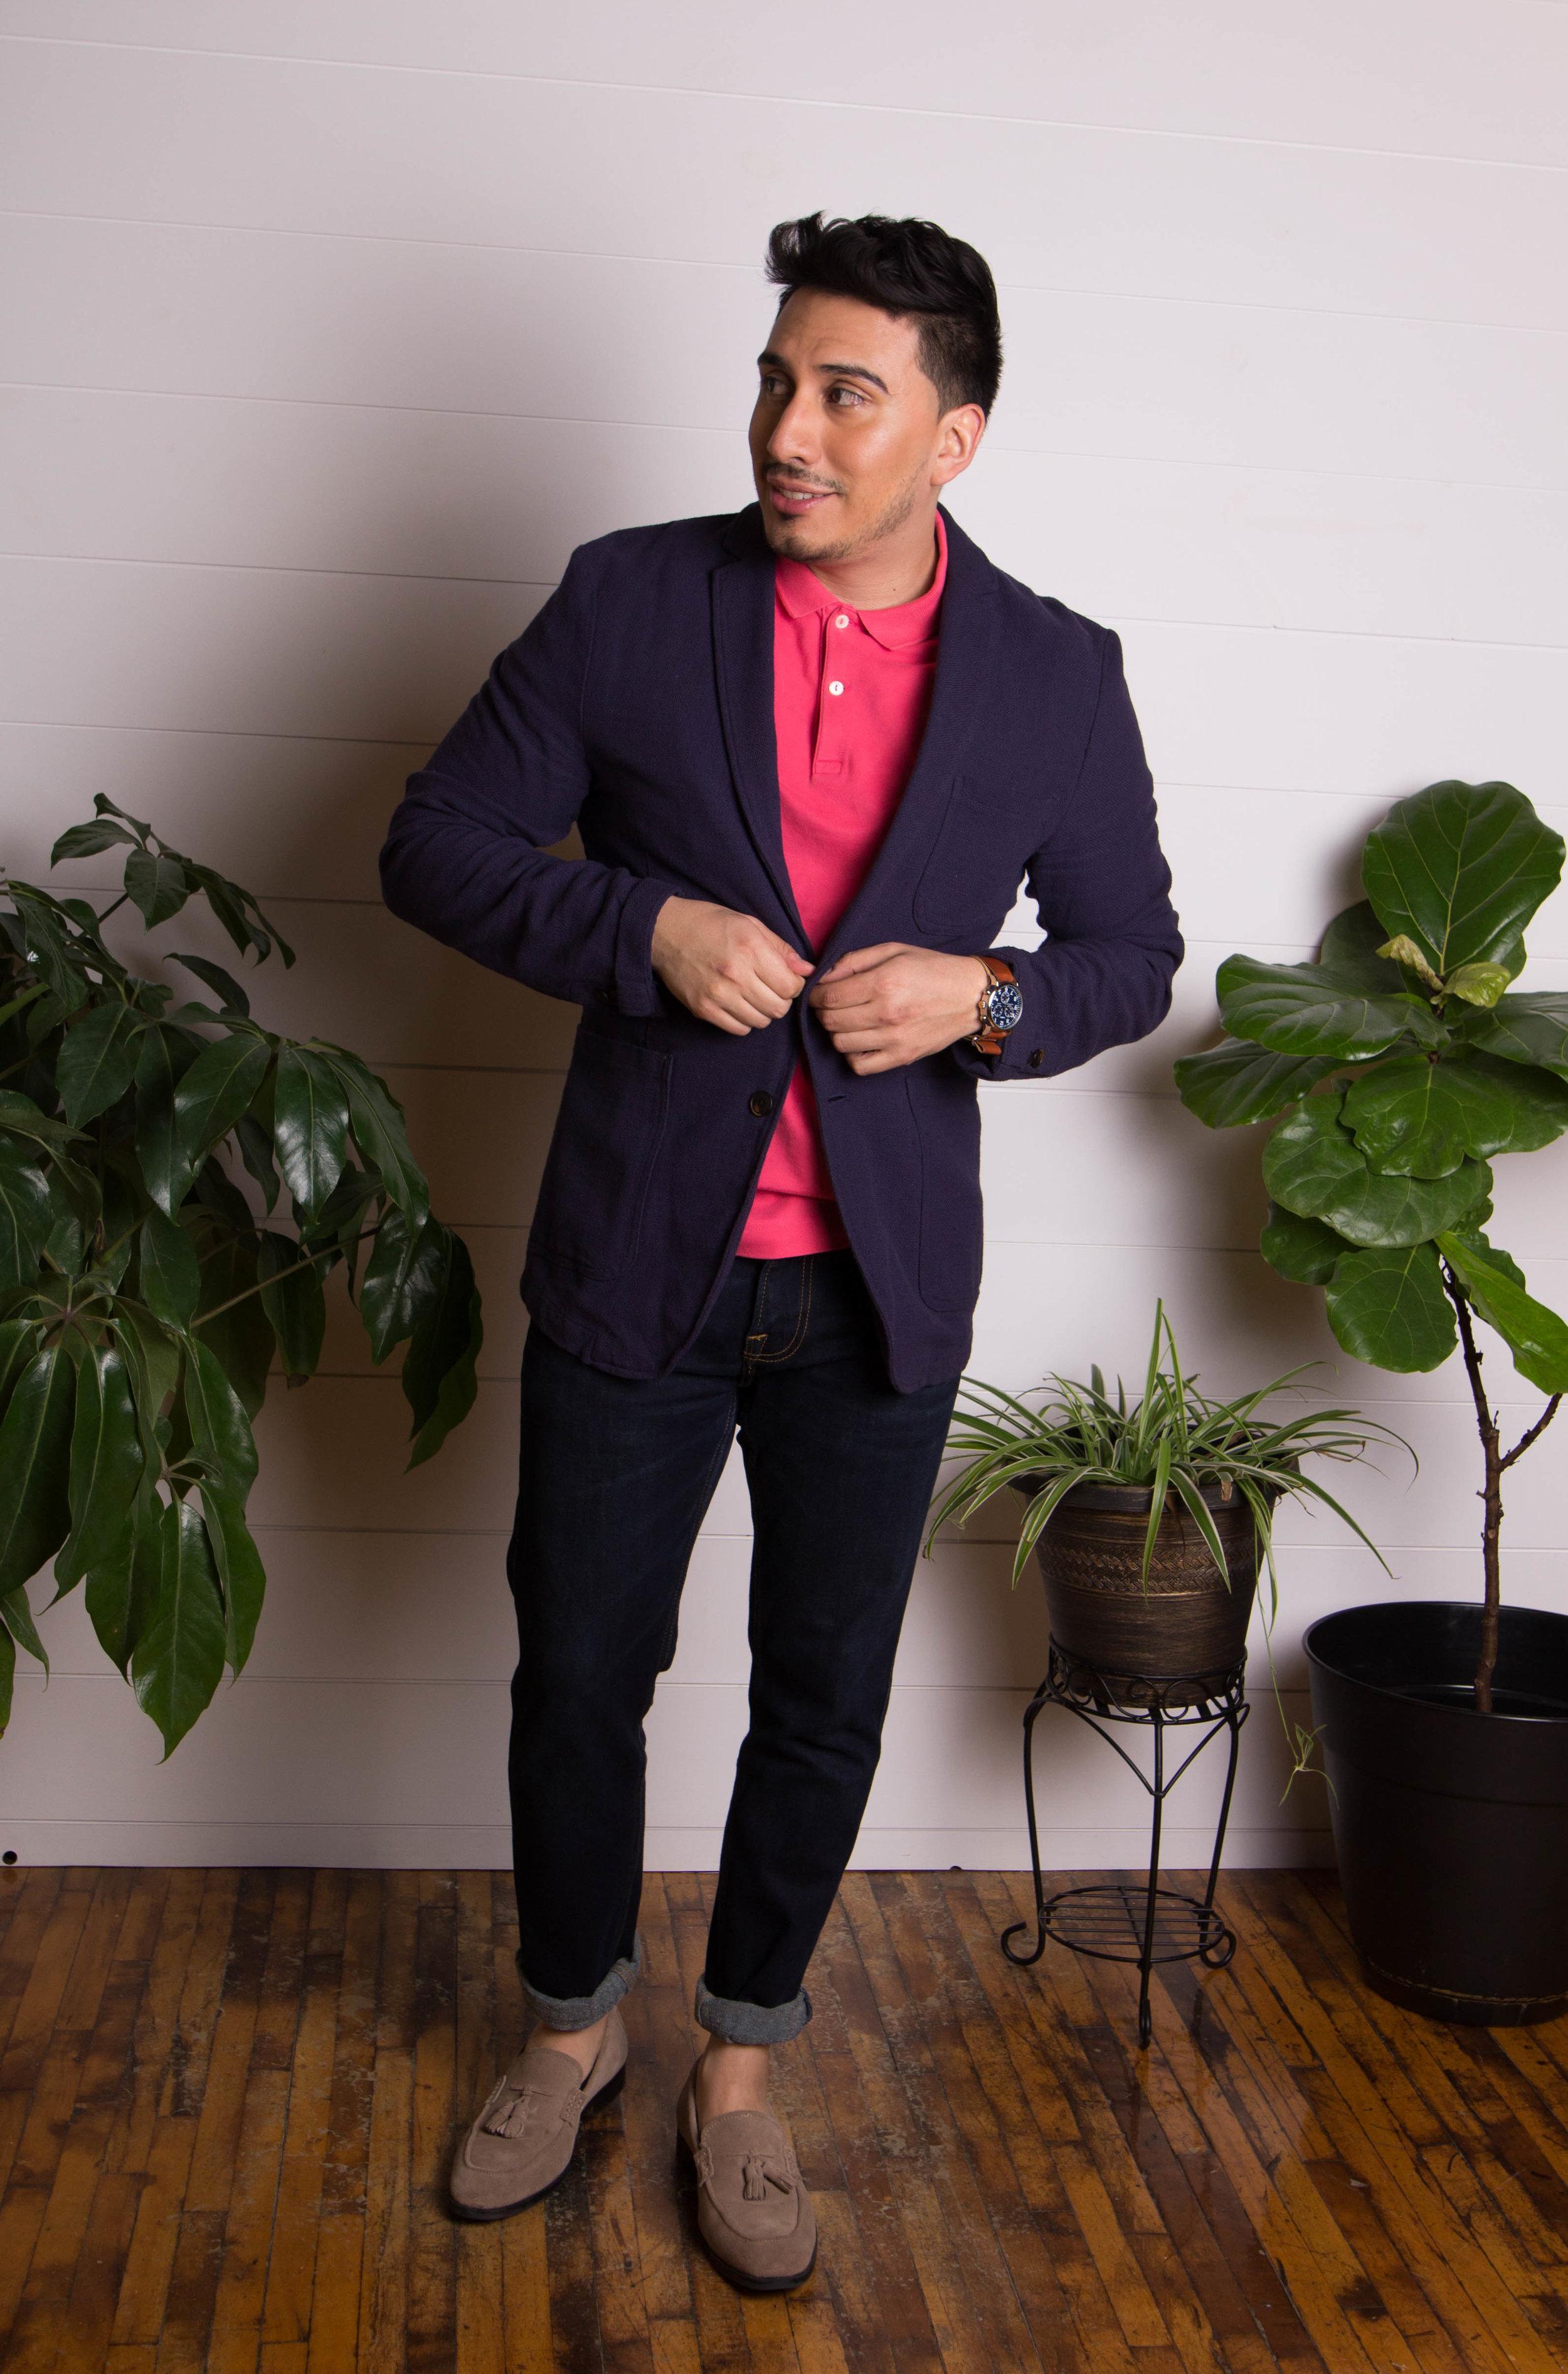 Publication: The Volk Creative Director: Meghanlee Phillips Photographer: Lucy Stange Wardrobe Stylist: Matthew Phillips Makeup & Hair: Jen Wiles & Ariana Pray Model: Ivan Martinez